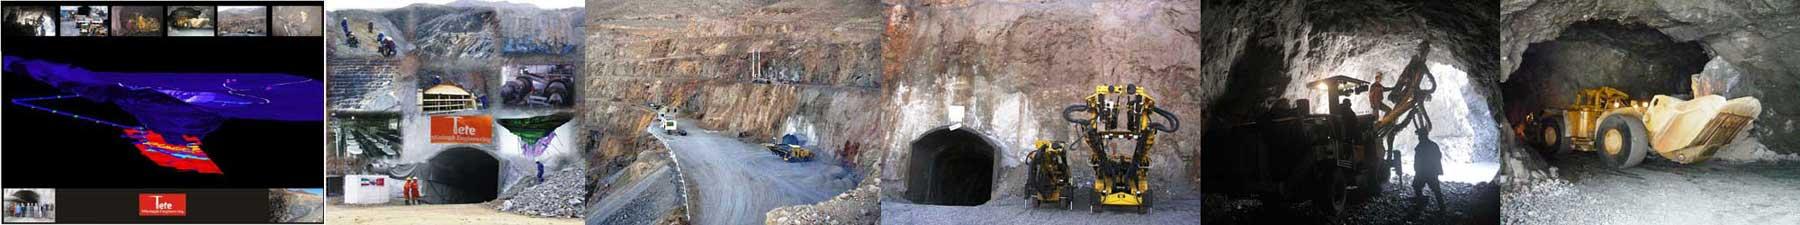 tete-mine.com Tete Mining